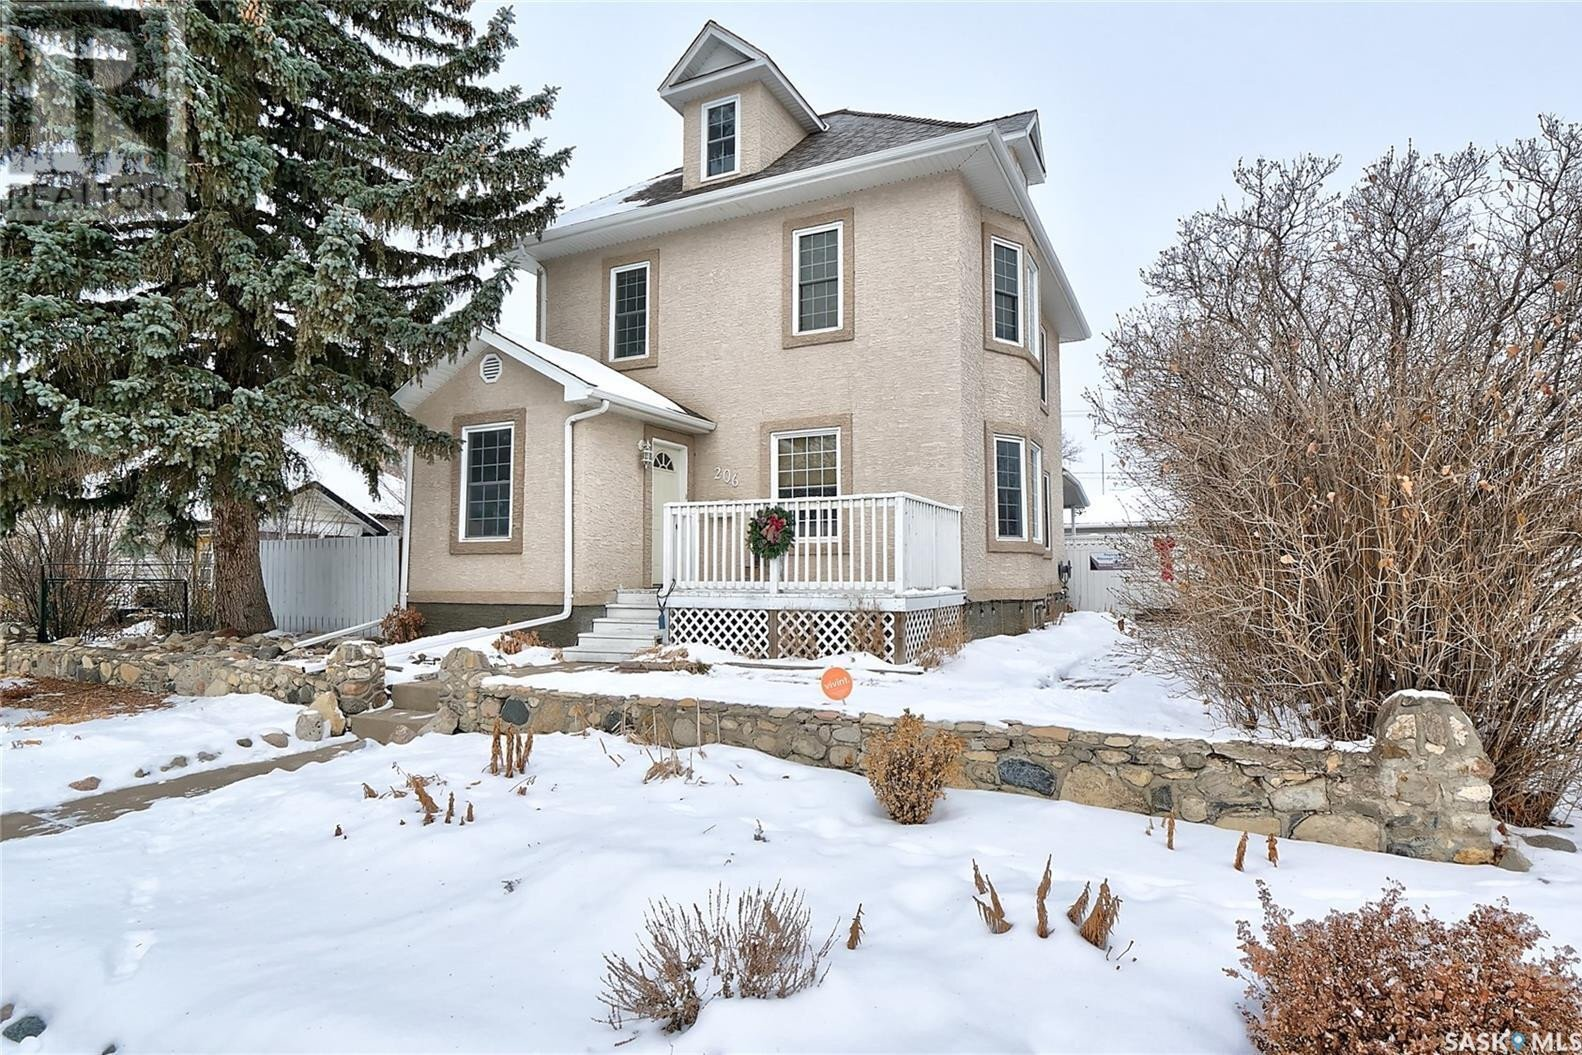 House for sale at 206 Hochelaga St W Moose Jaw Saskatchewan - MLS: SK826402